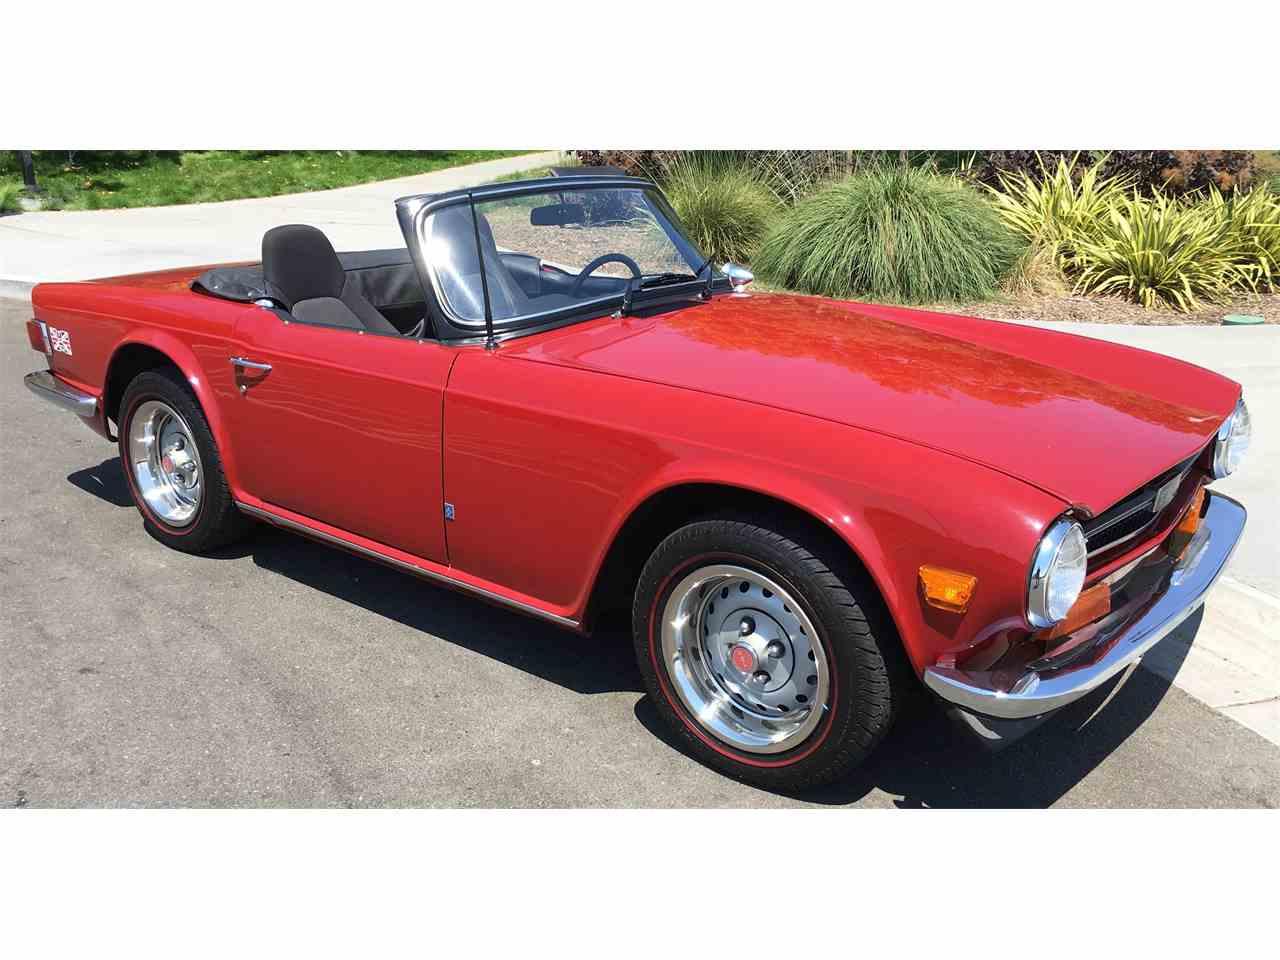 1973 Triumph TR6 for Sale | ClassicCars.com | CC-1009308